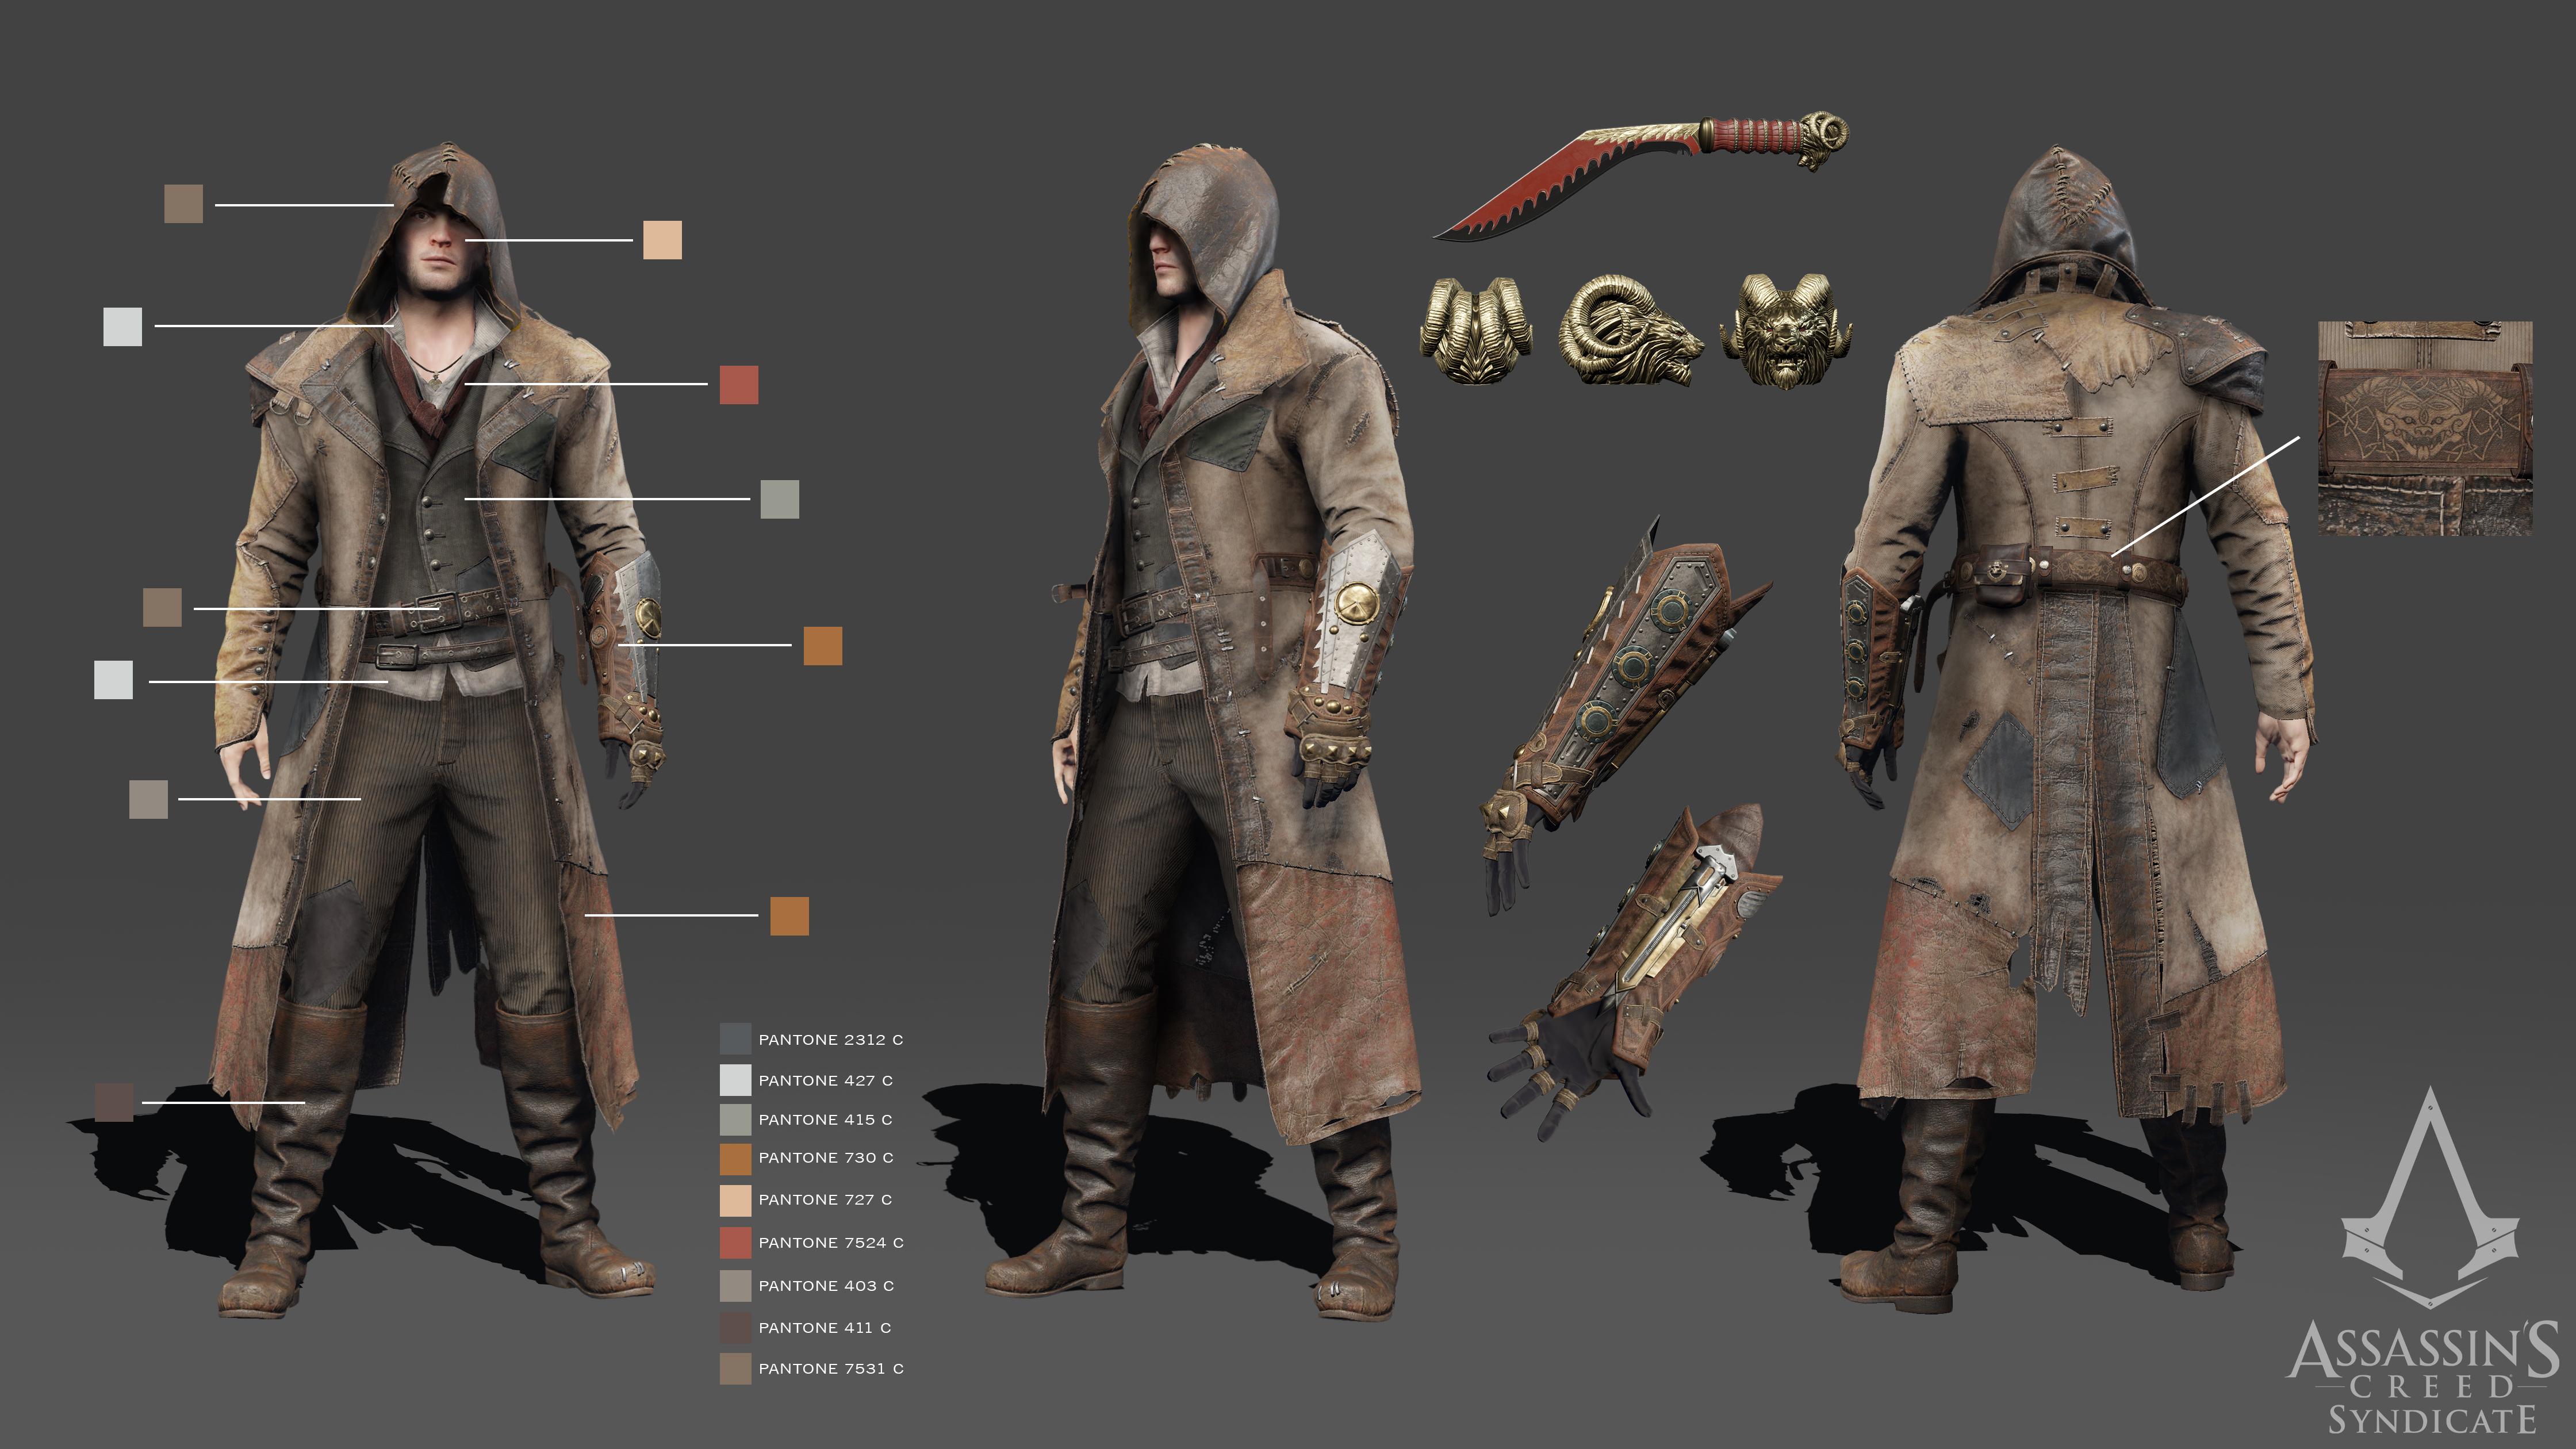 Jacob Frye Gallery Assassin S Creed Wiki Fandom